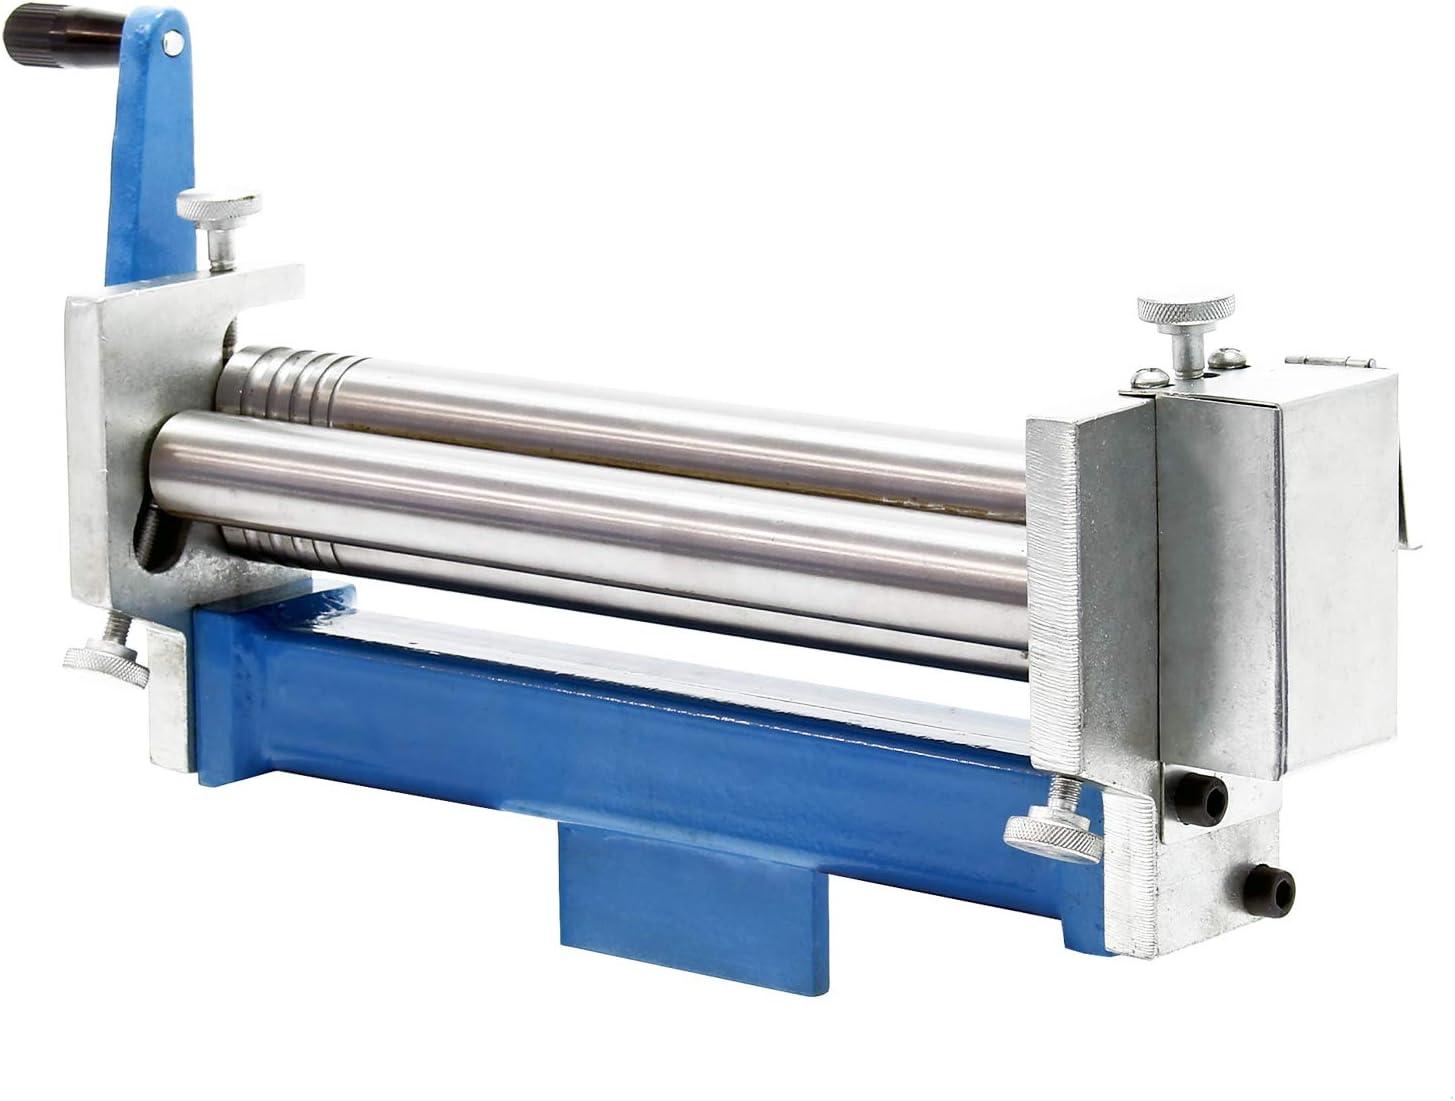 Drei-Walzen Rundbiegemaschine f/ür Werkst/ücke bis 320mm Biegemaschine Rundbiegeger/ät Blechbearbeitung